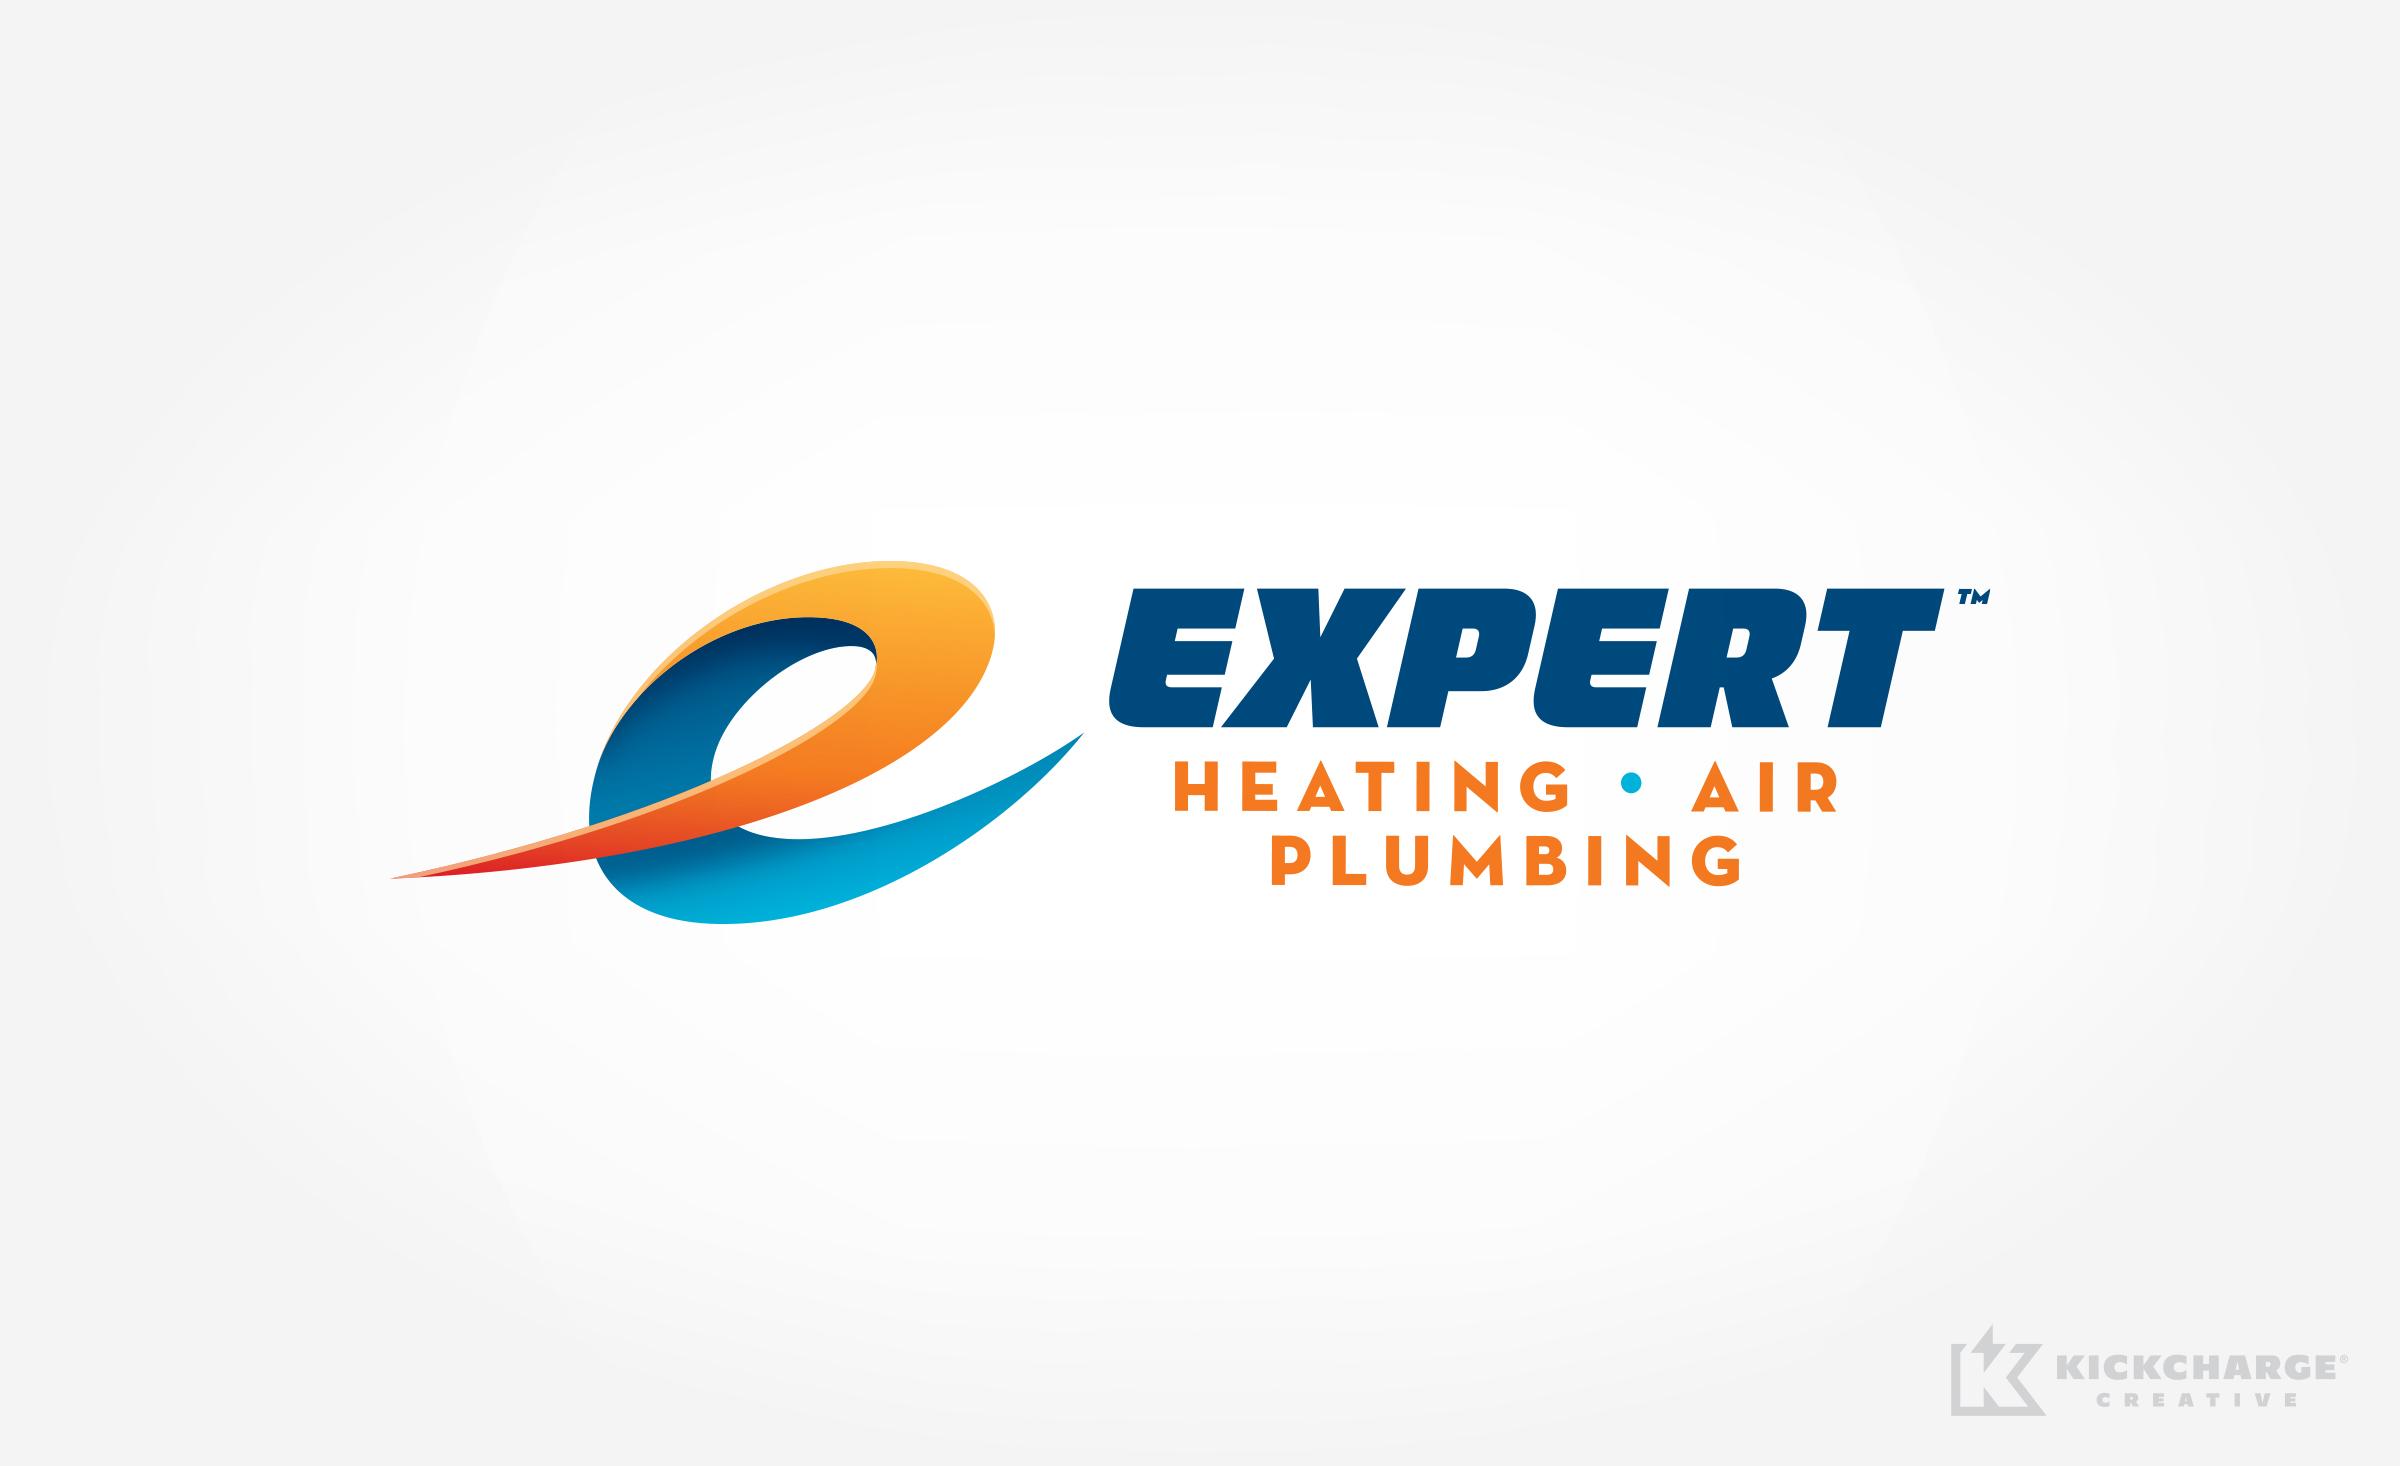 hvac logo for Expert Heating, Air & Plumbing